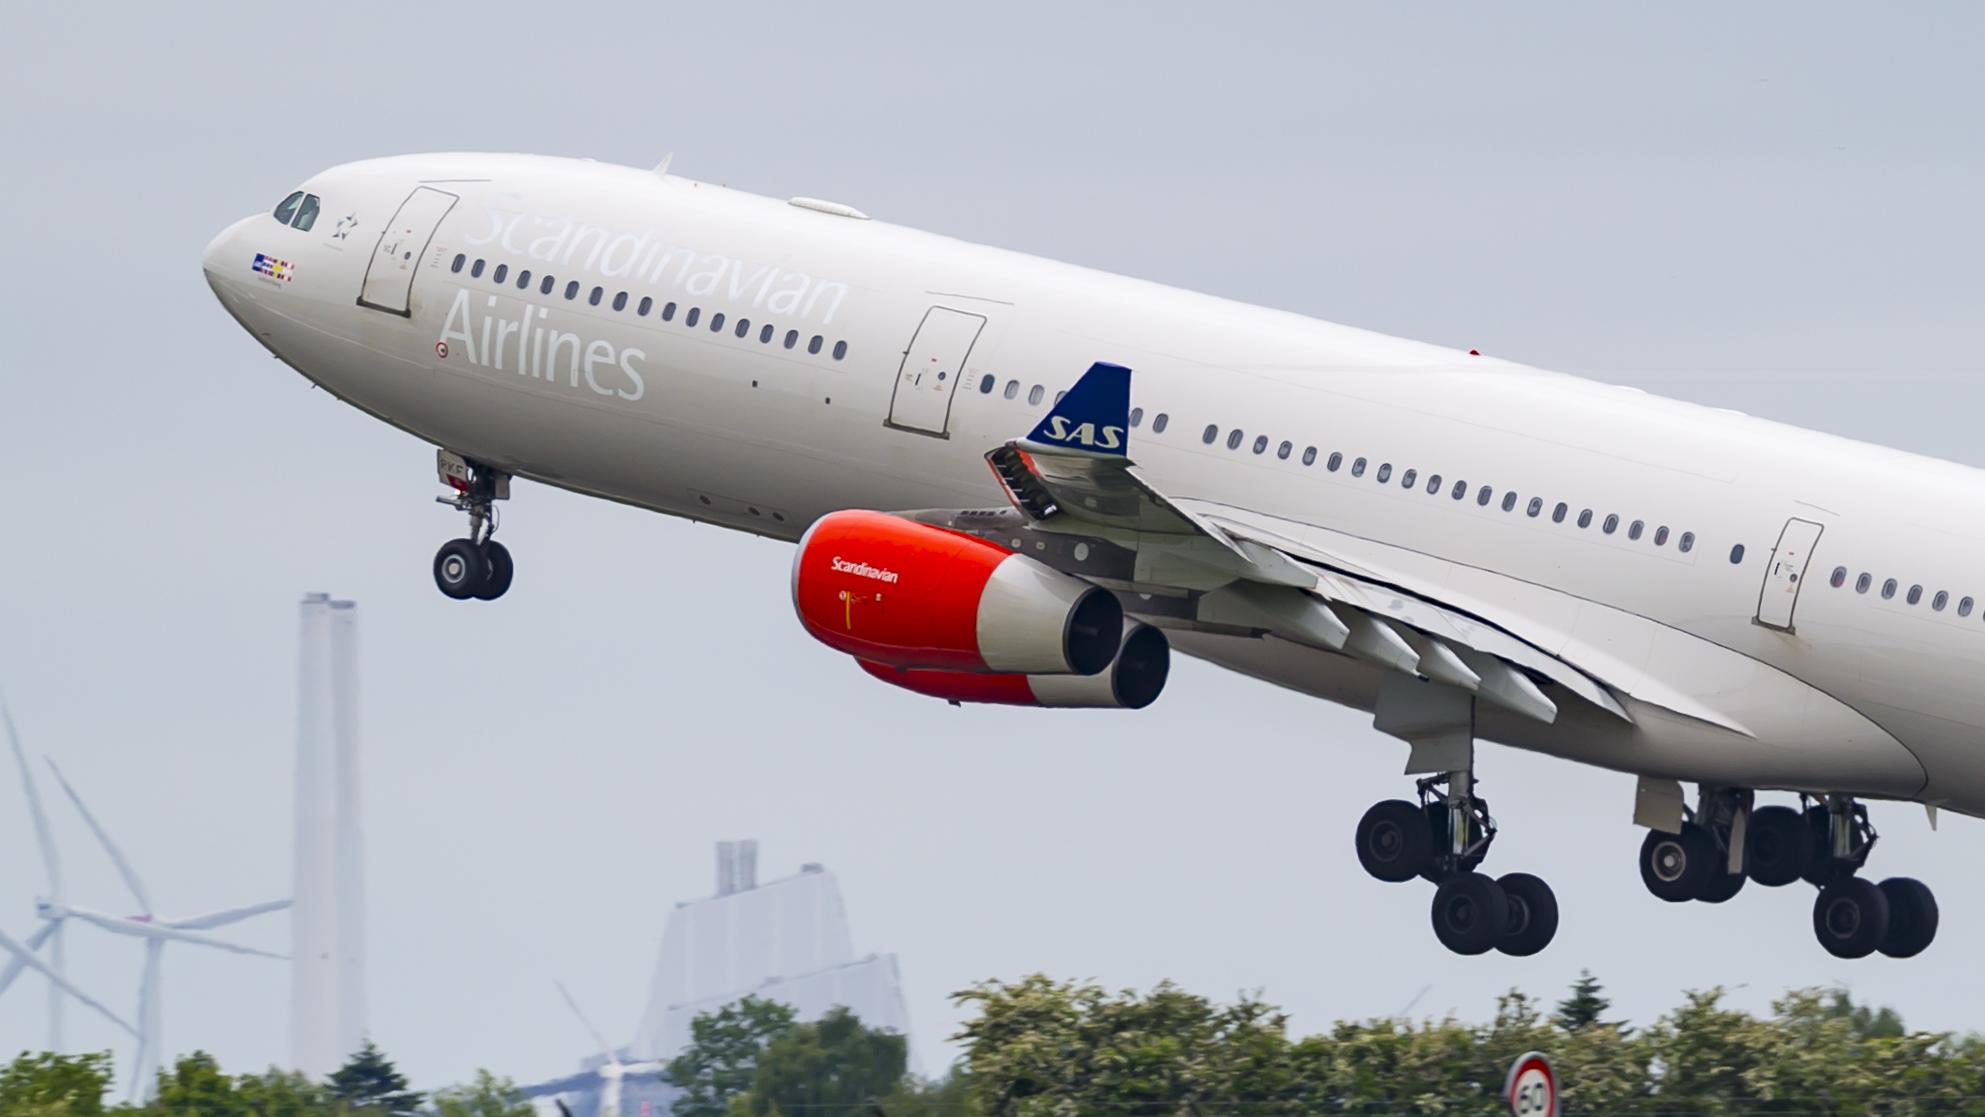 En Airbus A340-300 fra SAS. Foto: © Thorbjørn Brunander Sund, Danish Aviation Photo